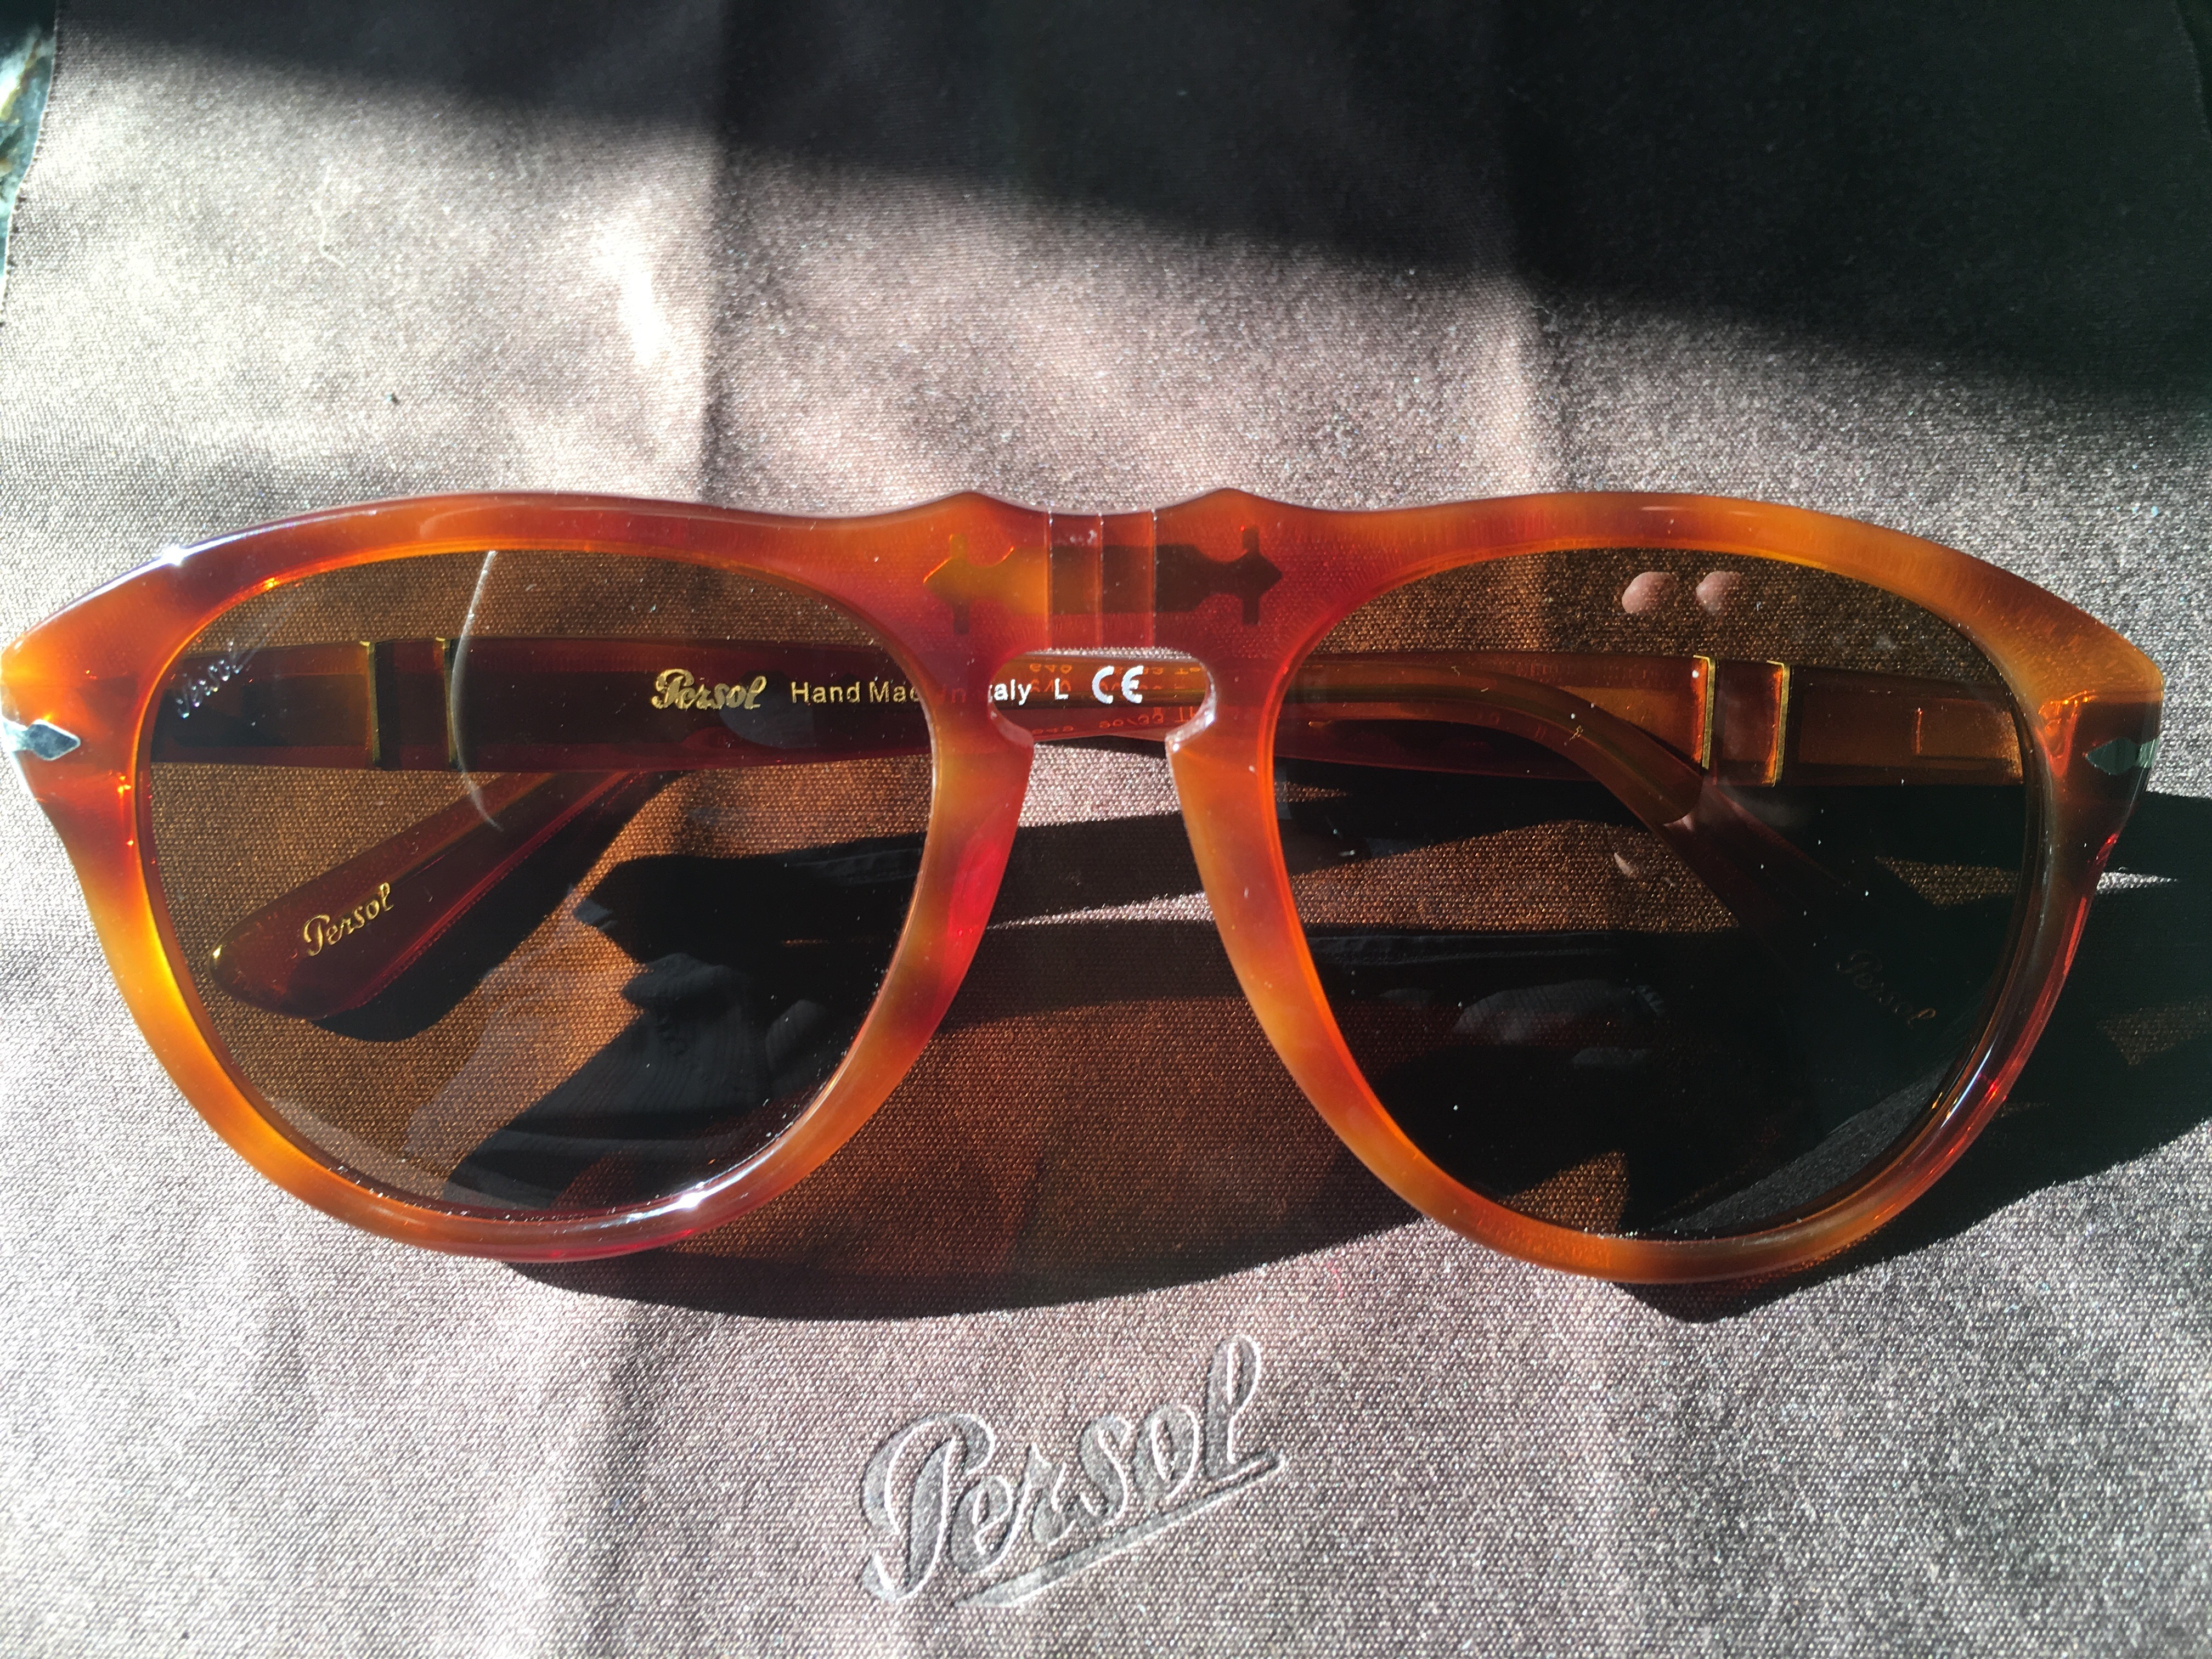 3ded31bef2 Persol 649 Series - PO0649 in Terra di Siena Size one size - Sunglasses for  Sale - Grailed